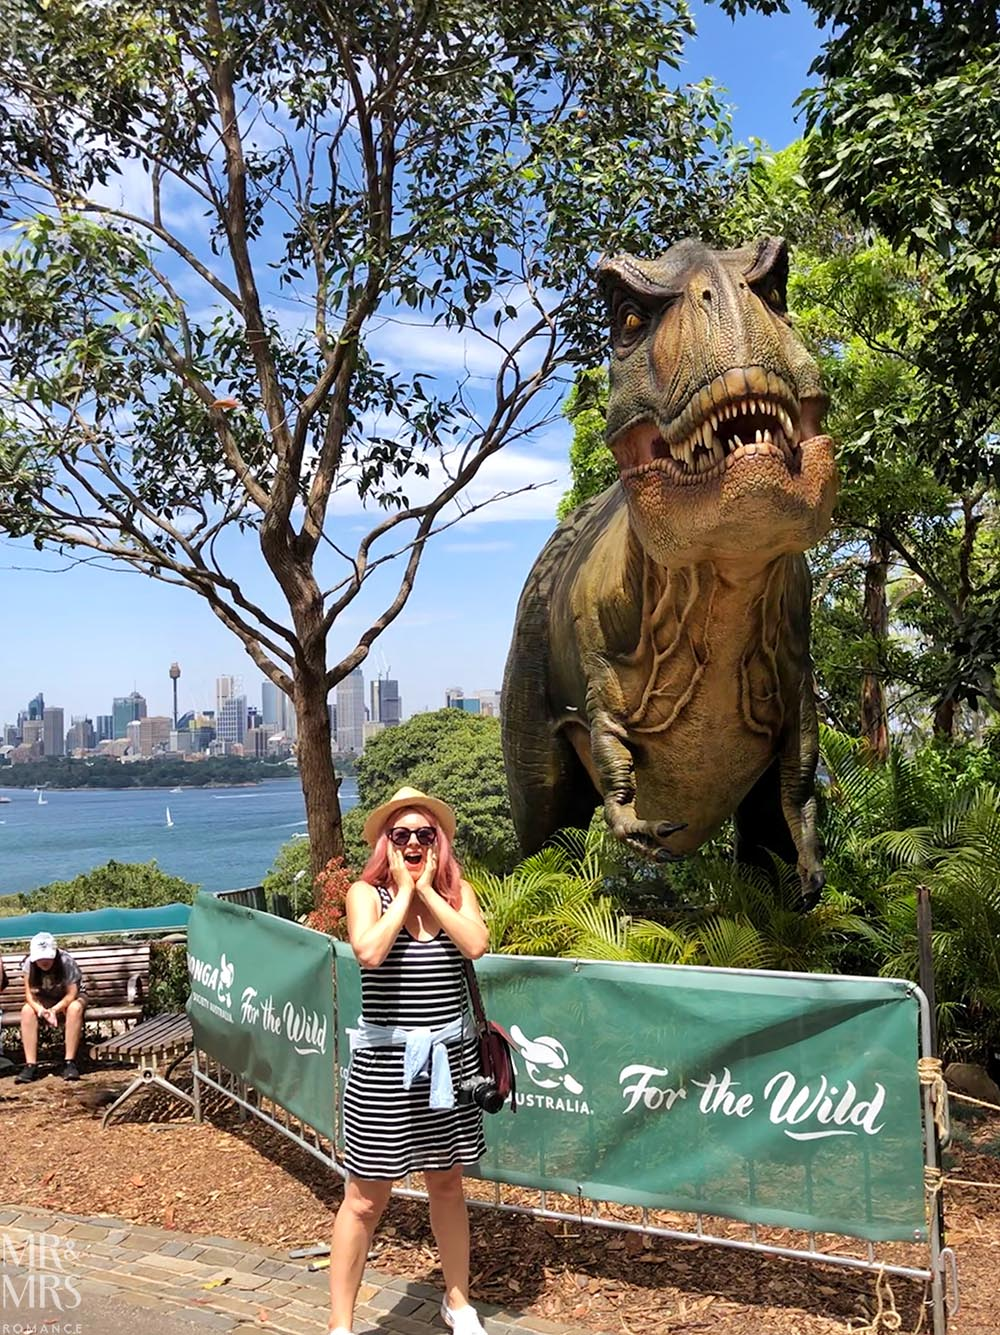 Taronga Zoo - dinosaurs!